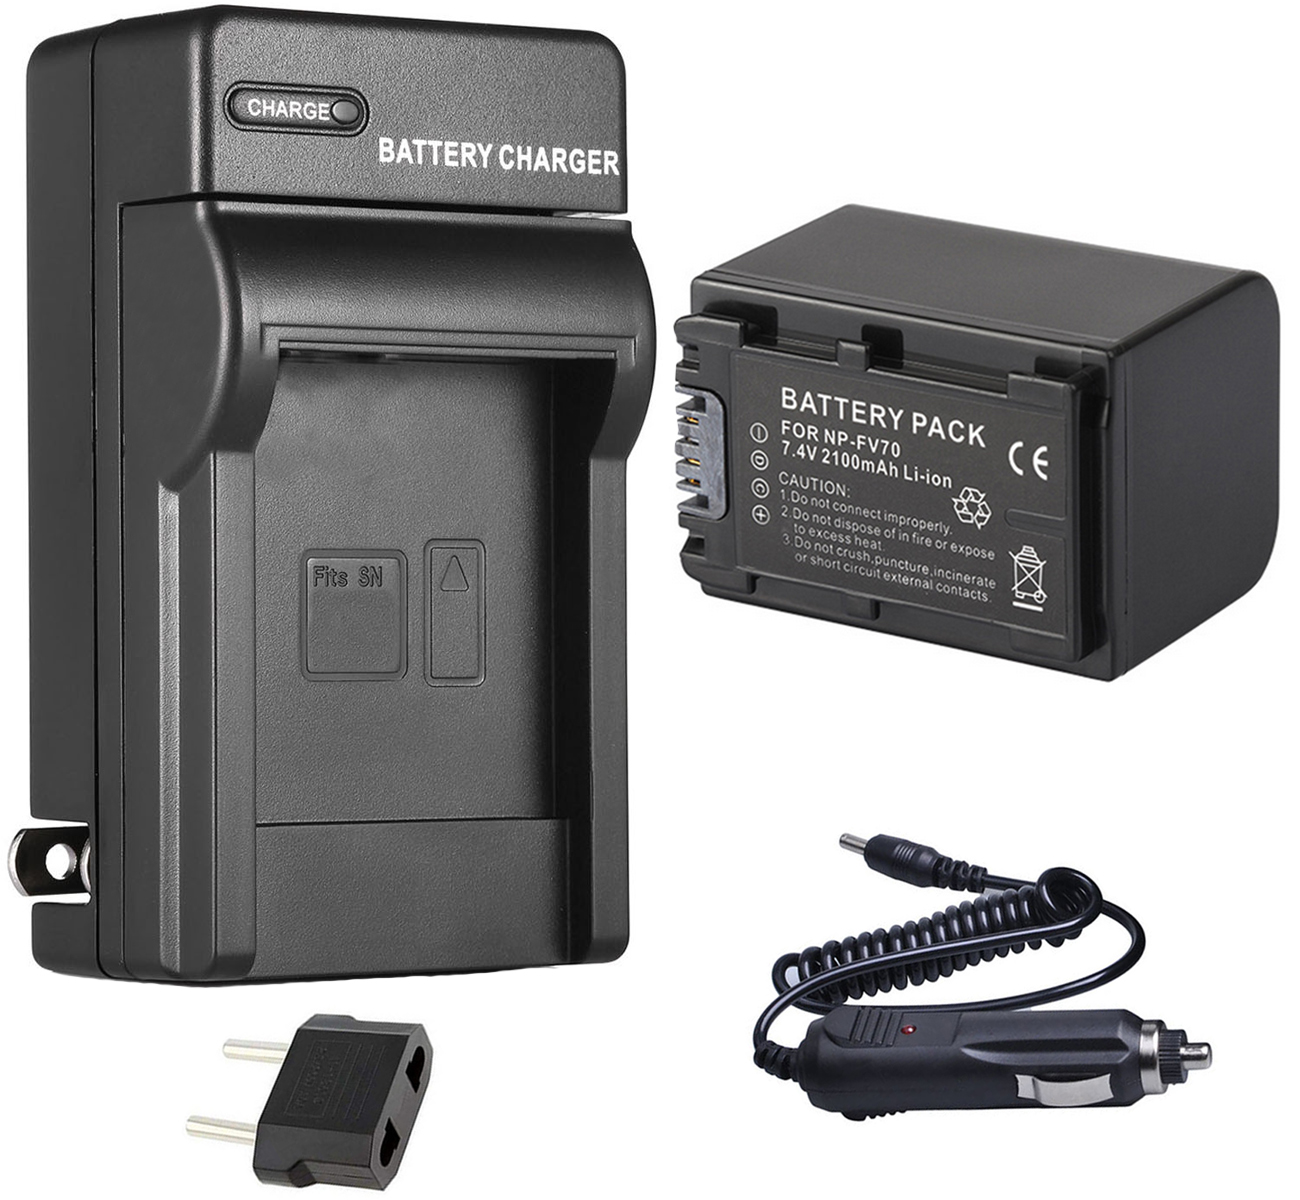 BATTERIA CAMCORDER-CARICABATTERIE MICRO USB PER Sony Handycam hdr-cx250e